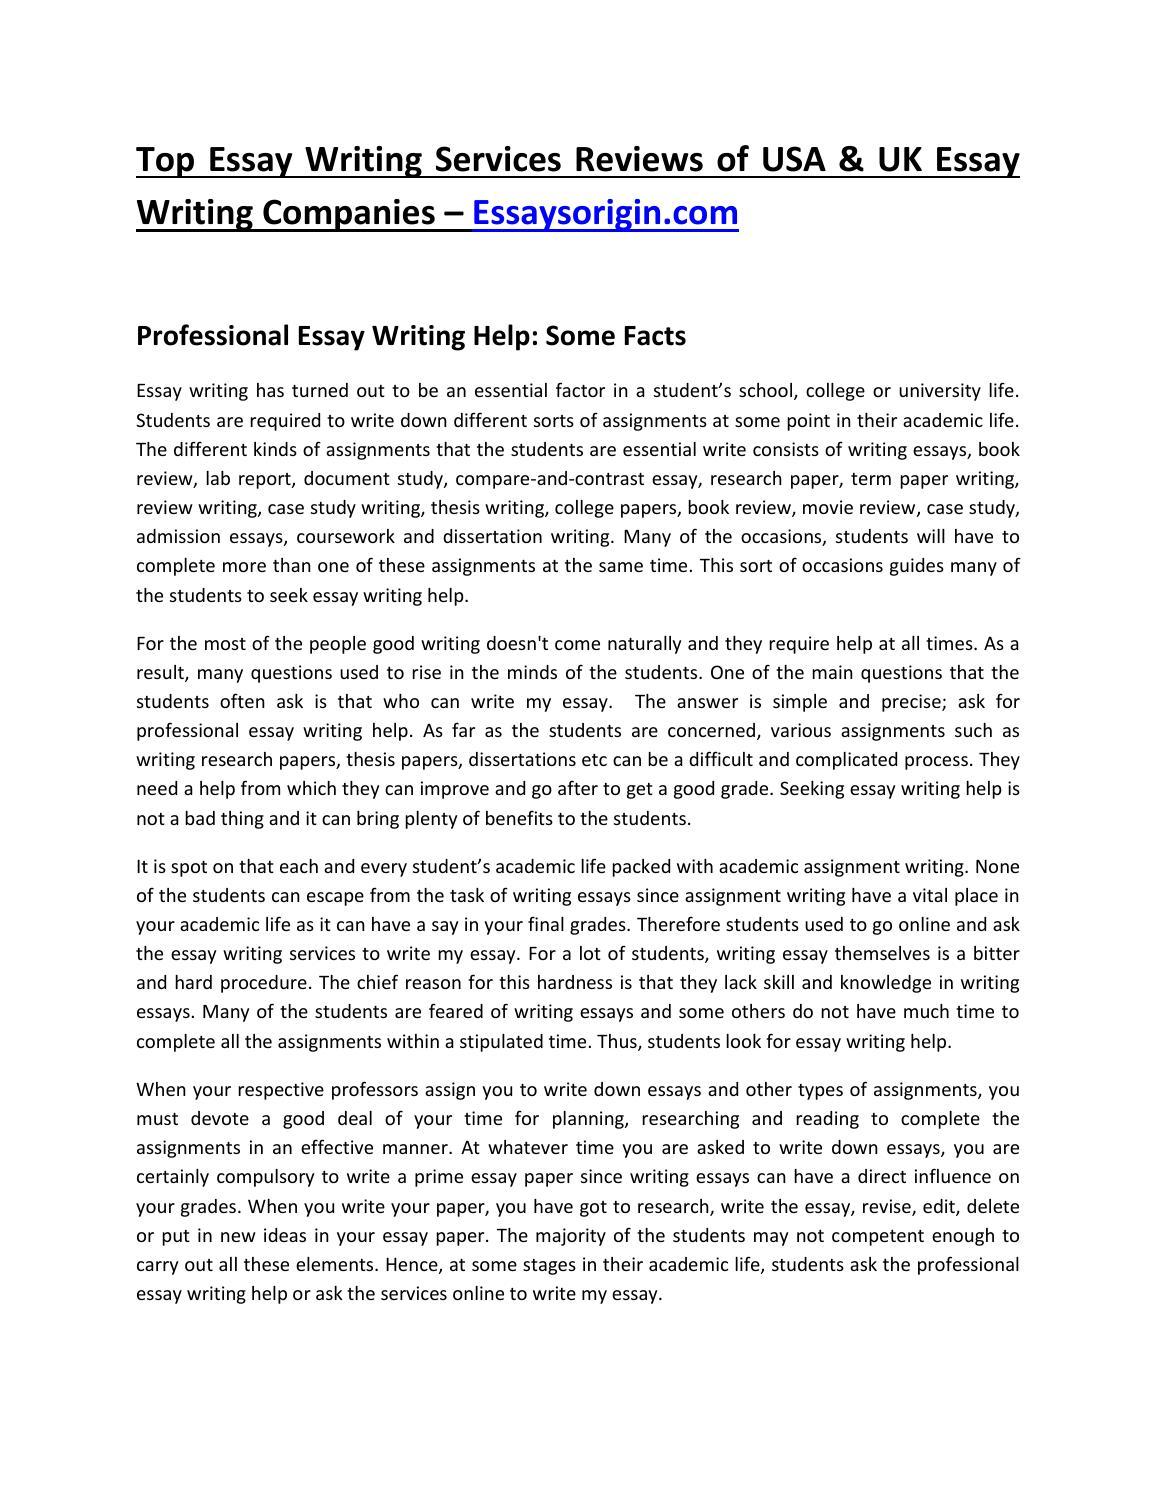 top essay writing companies